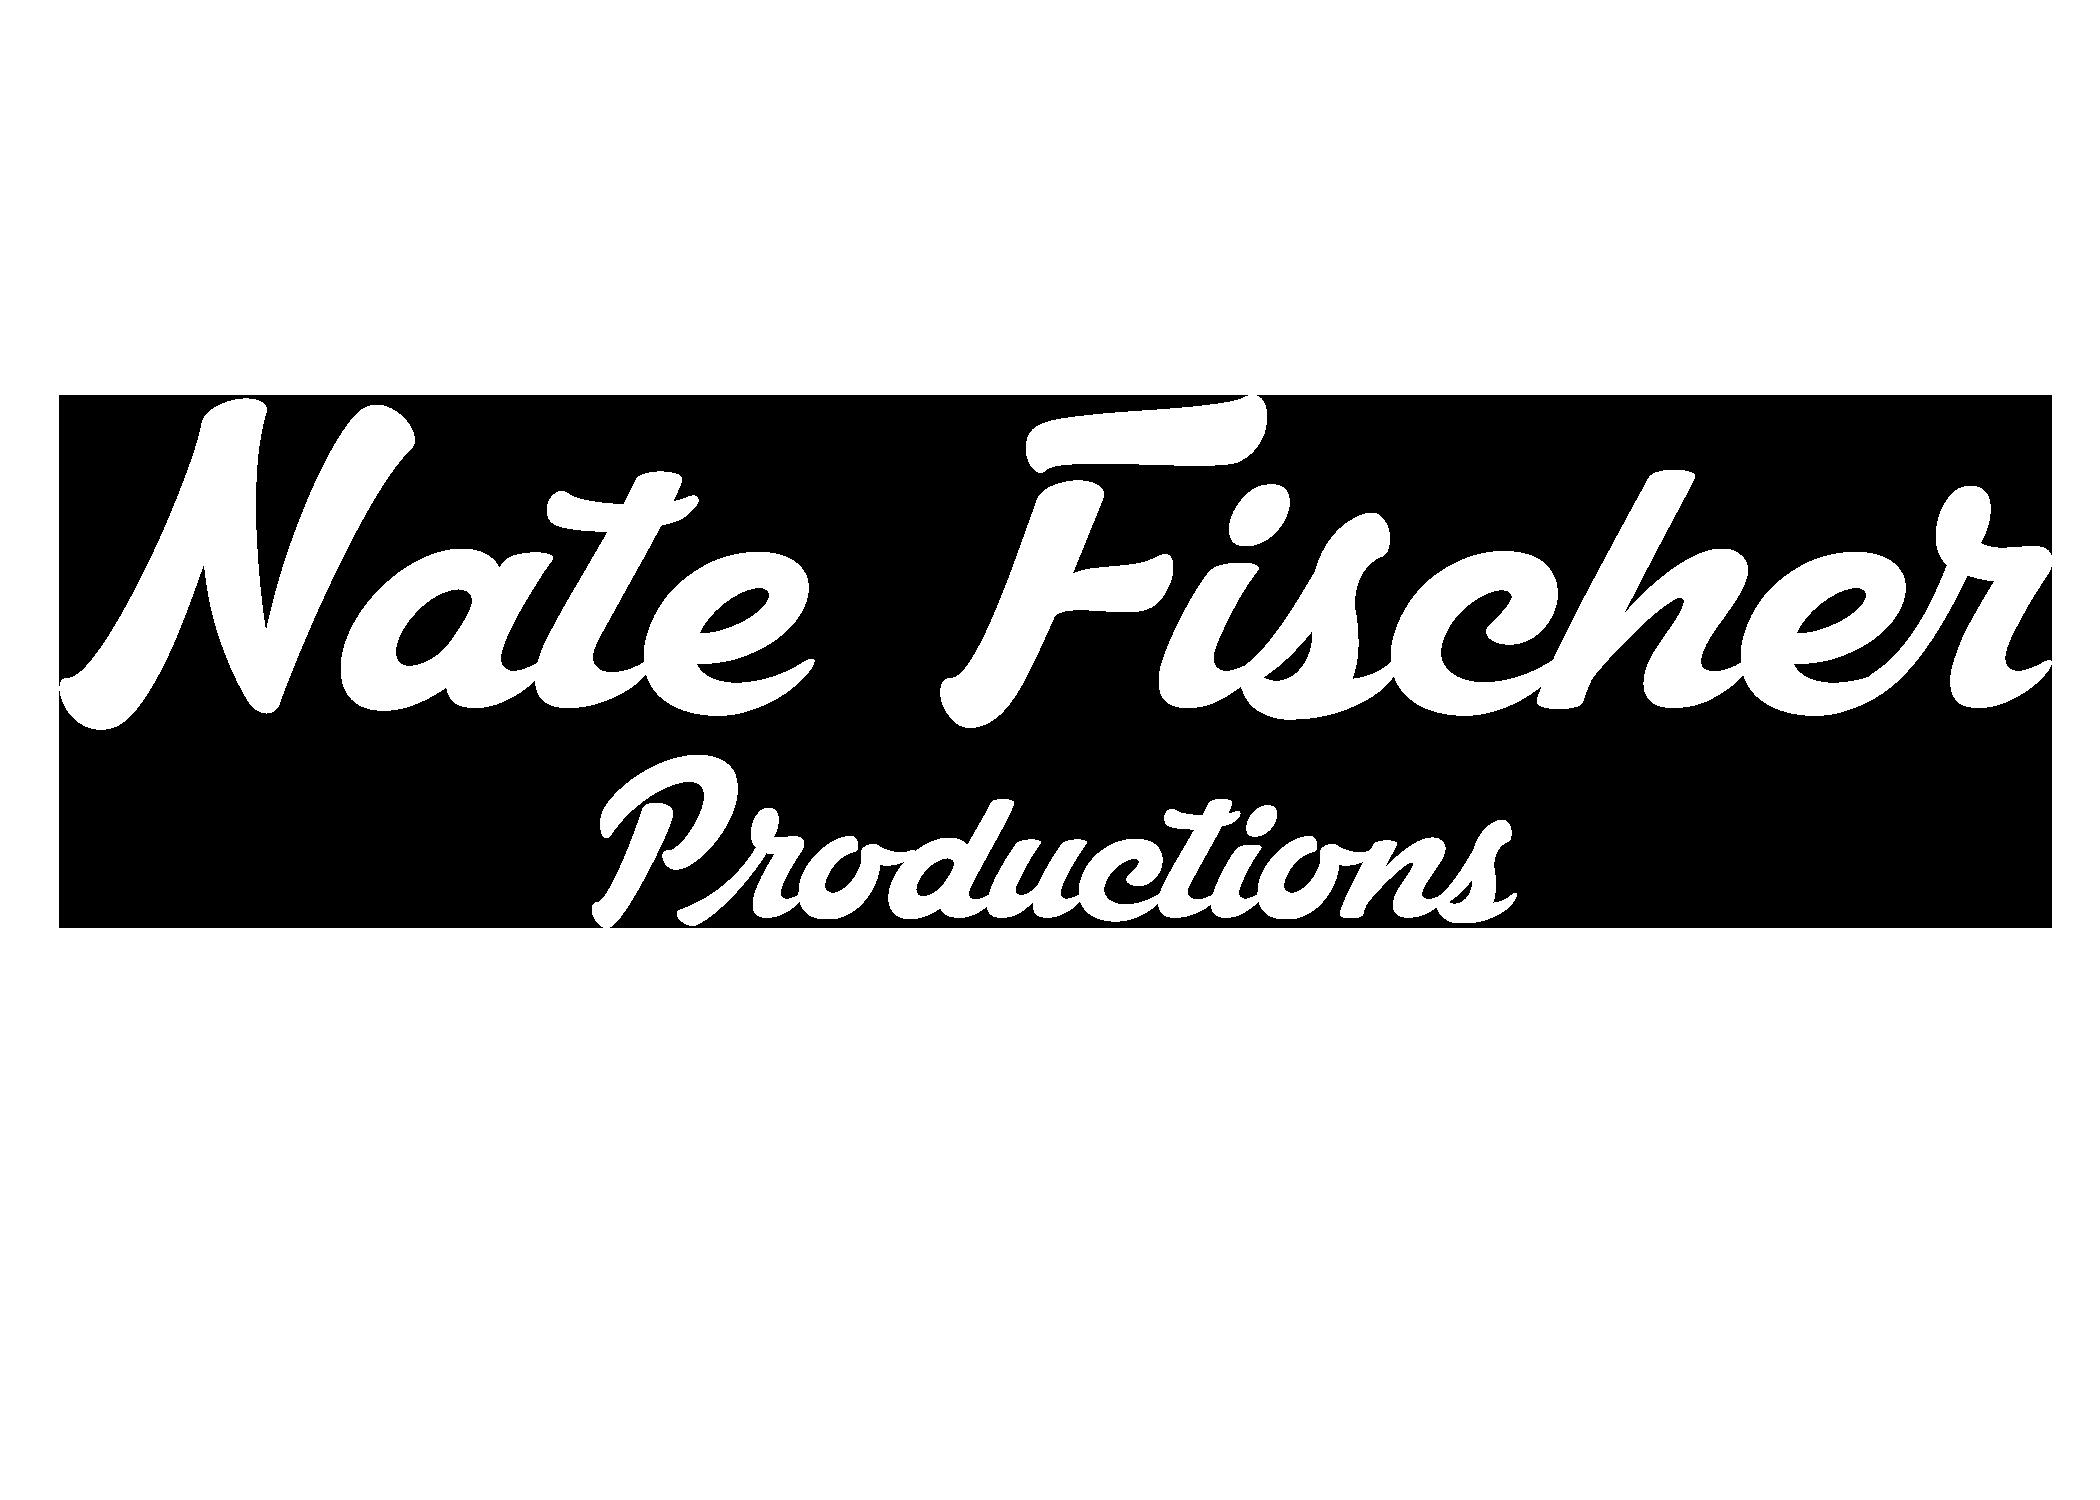 Nathan Fischer